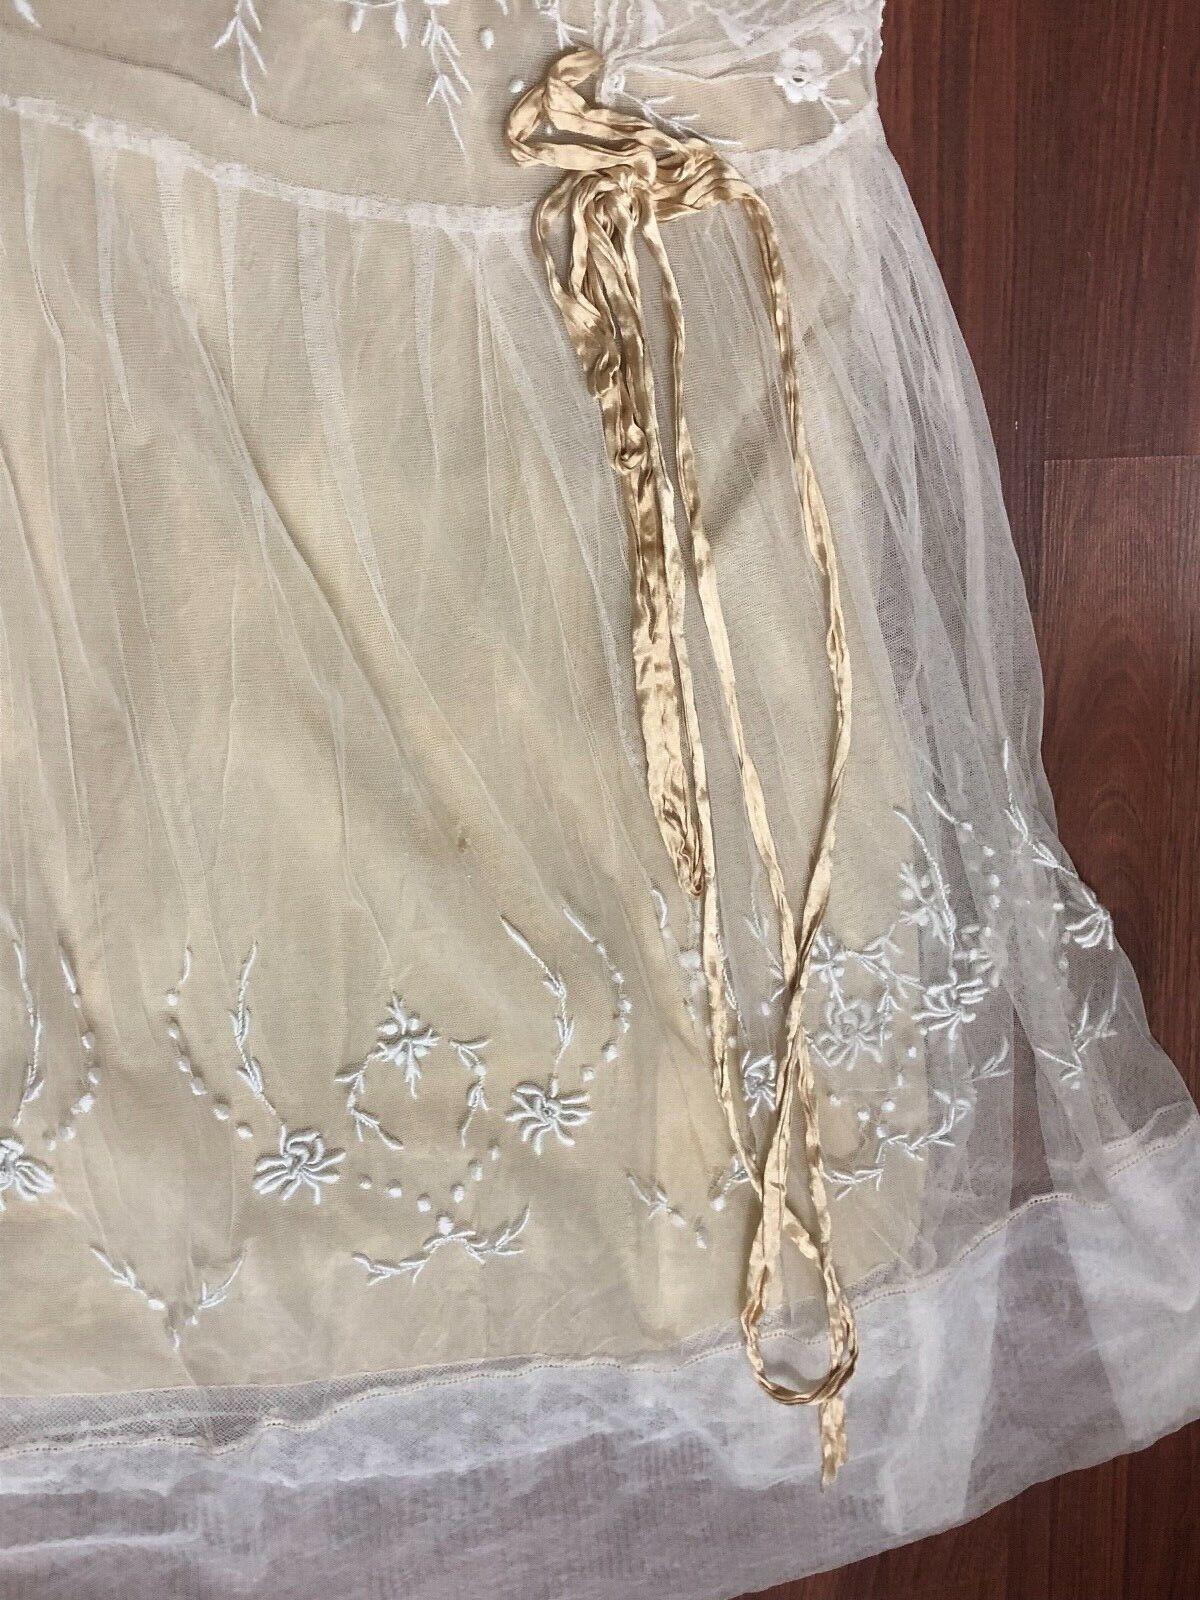 Antique Edwardian White Mesh Dress with Floral Em… - image 6